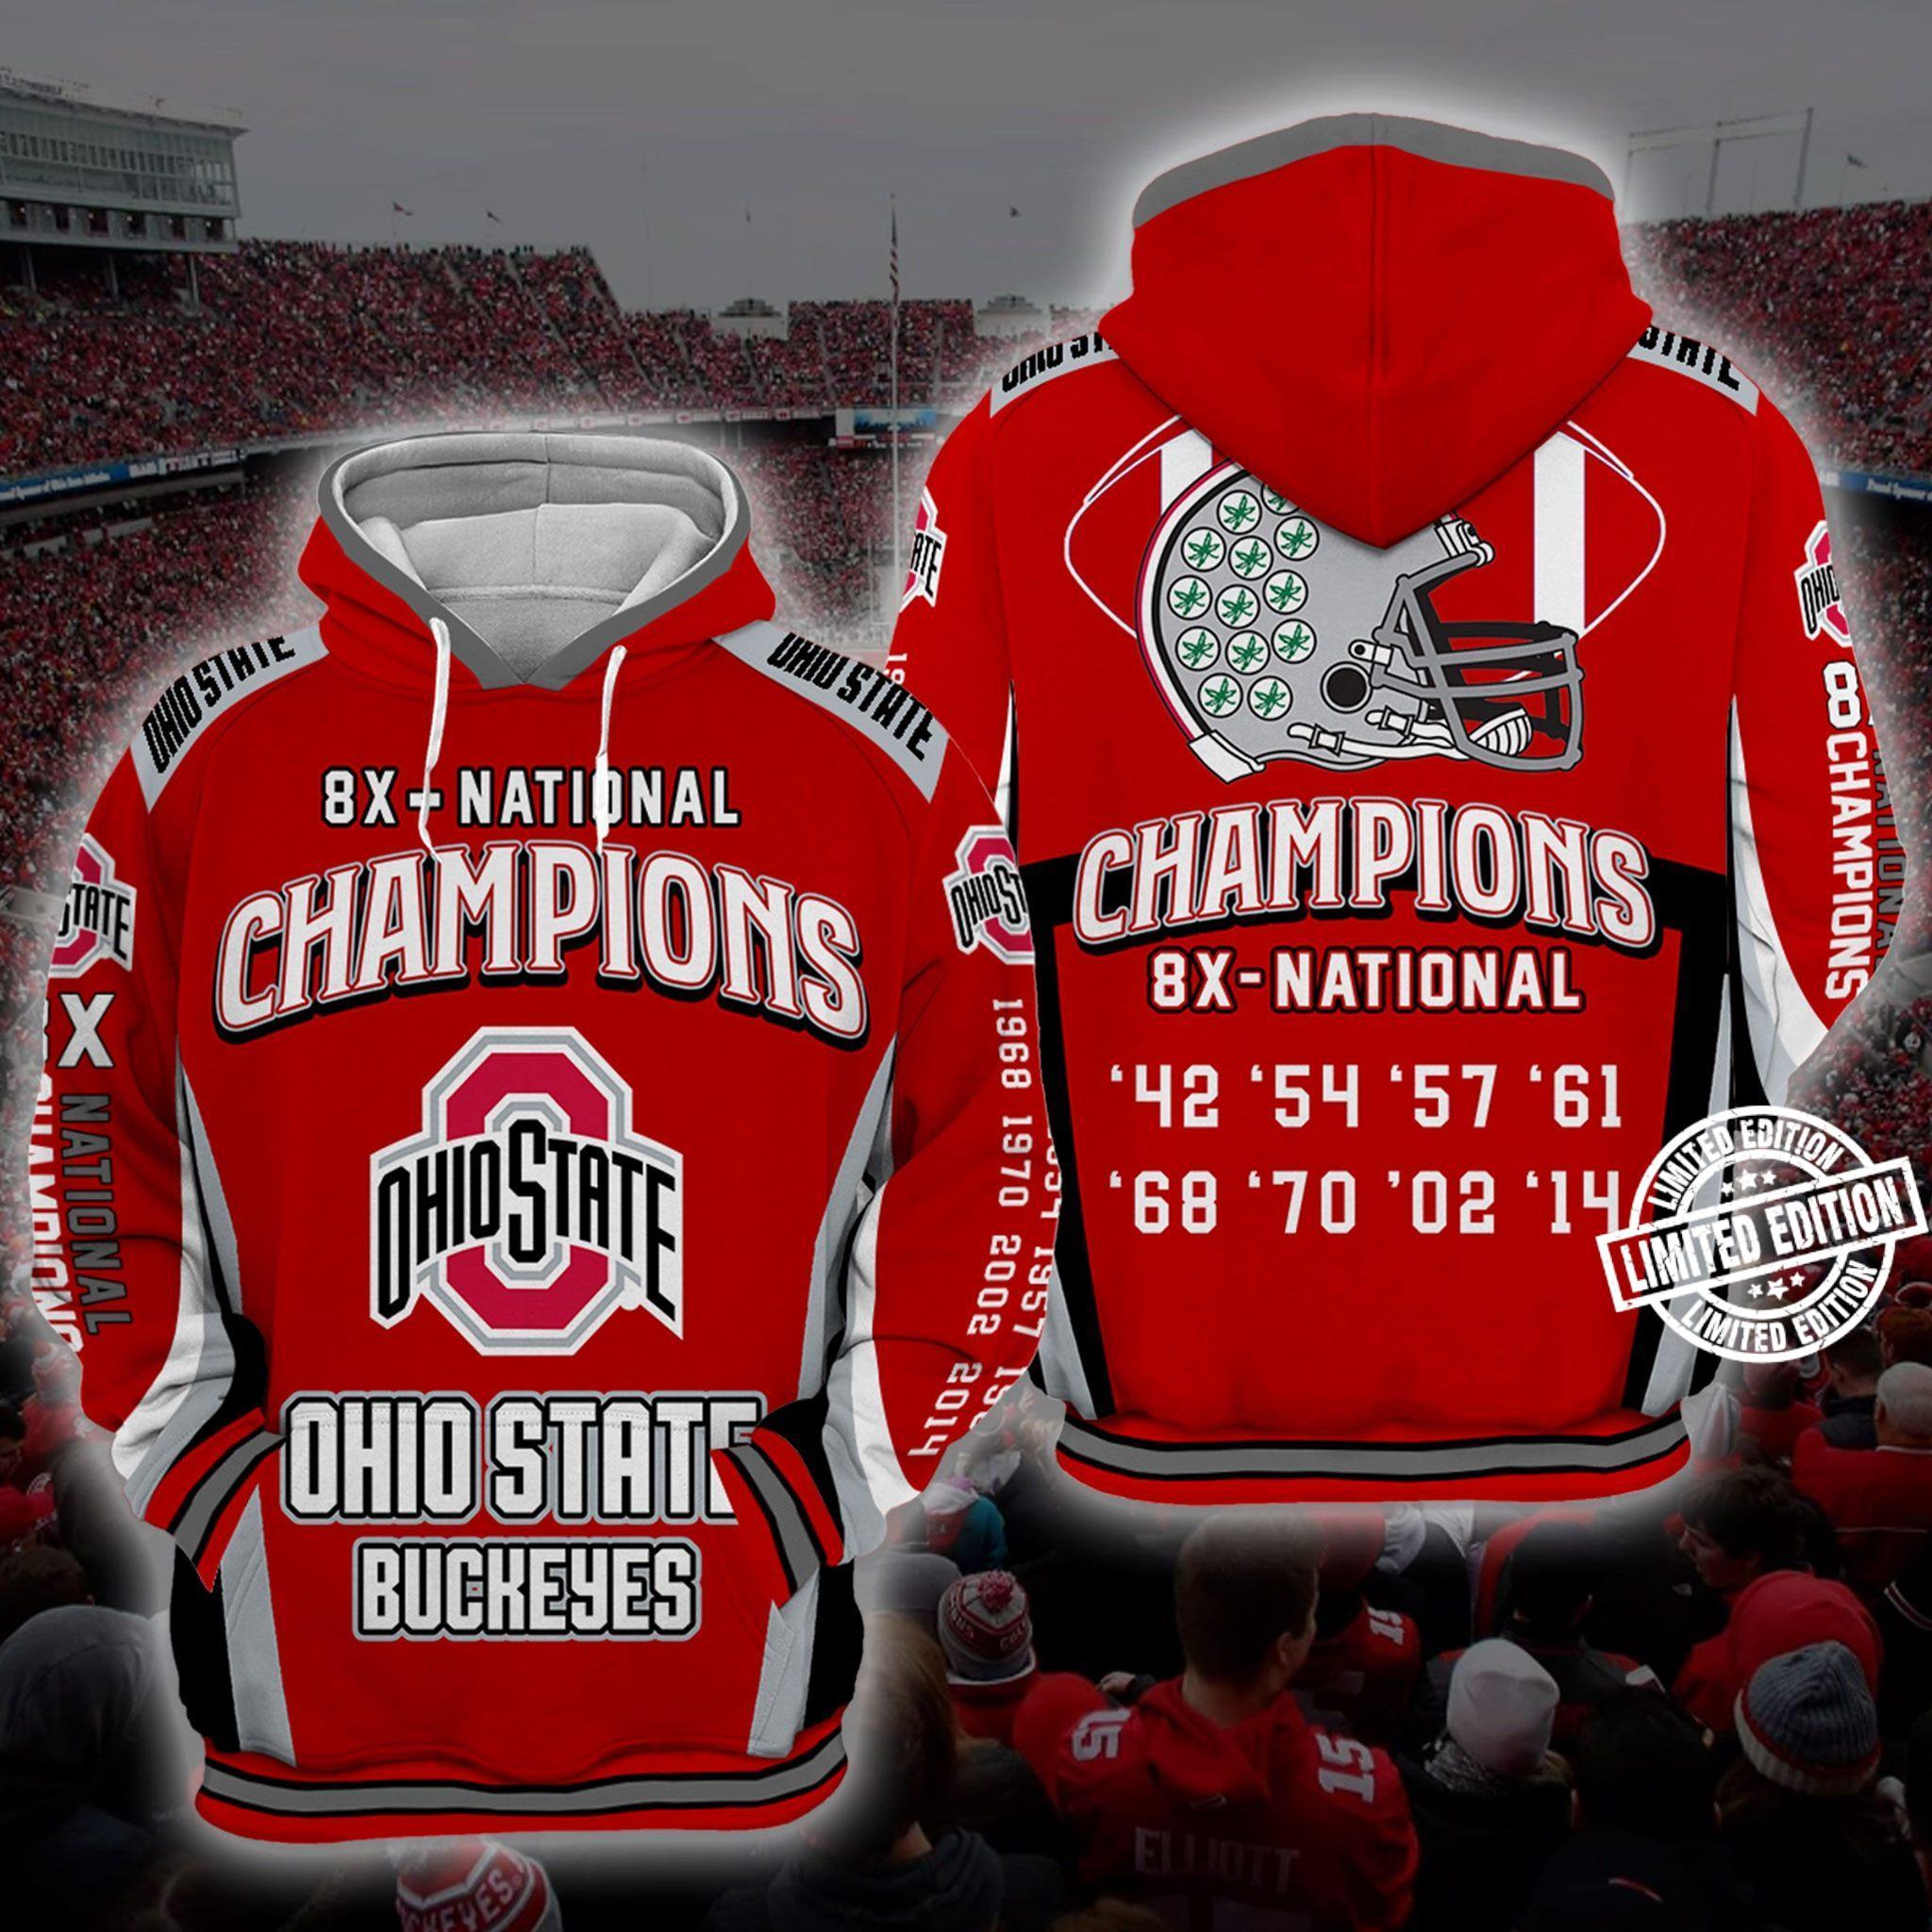 8x - national champions OhioState Buckeyes shirt